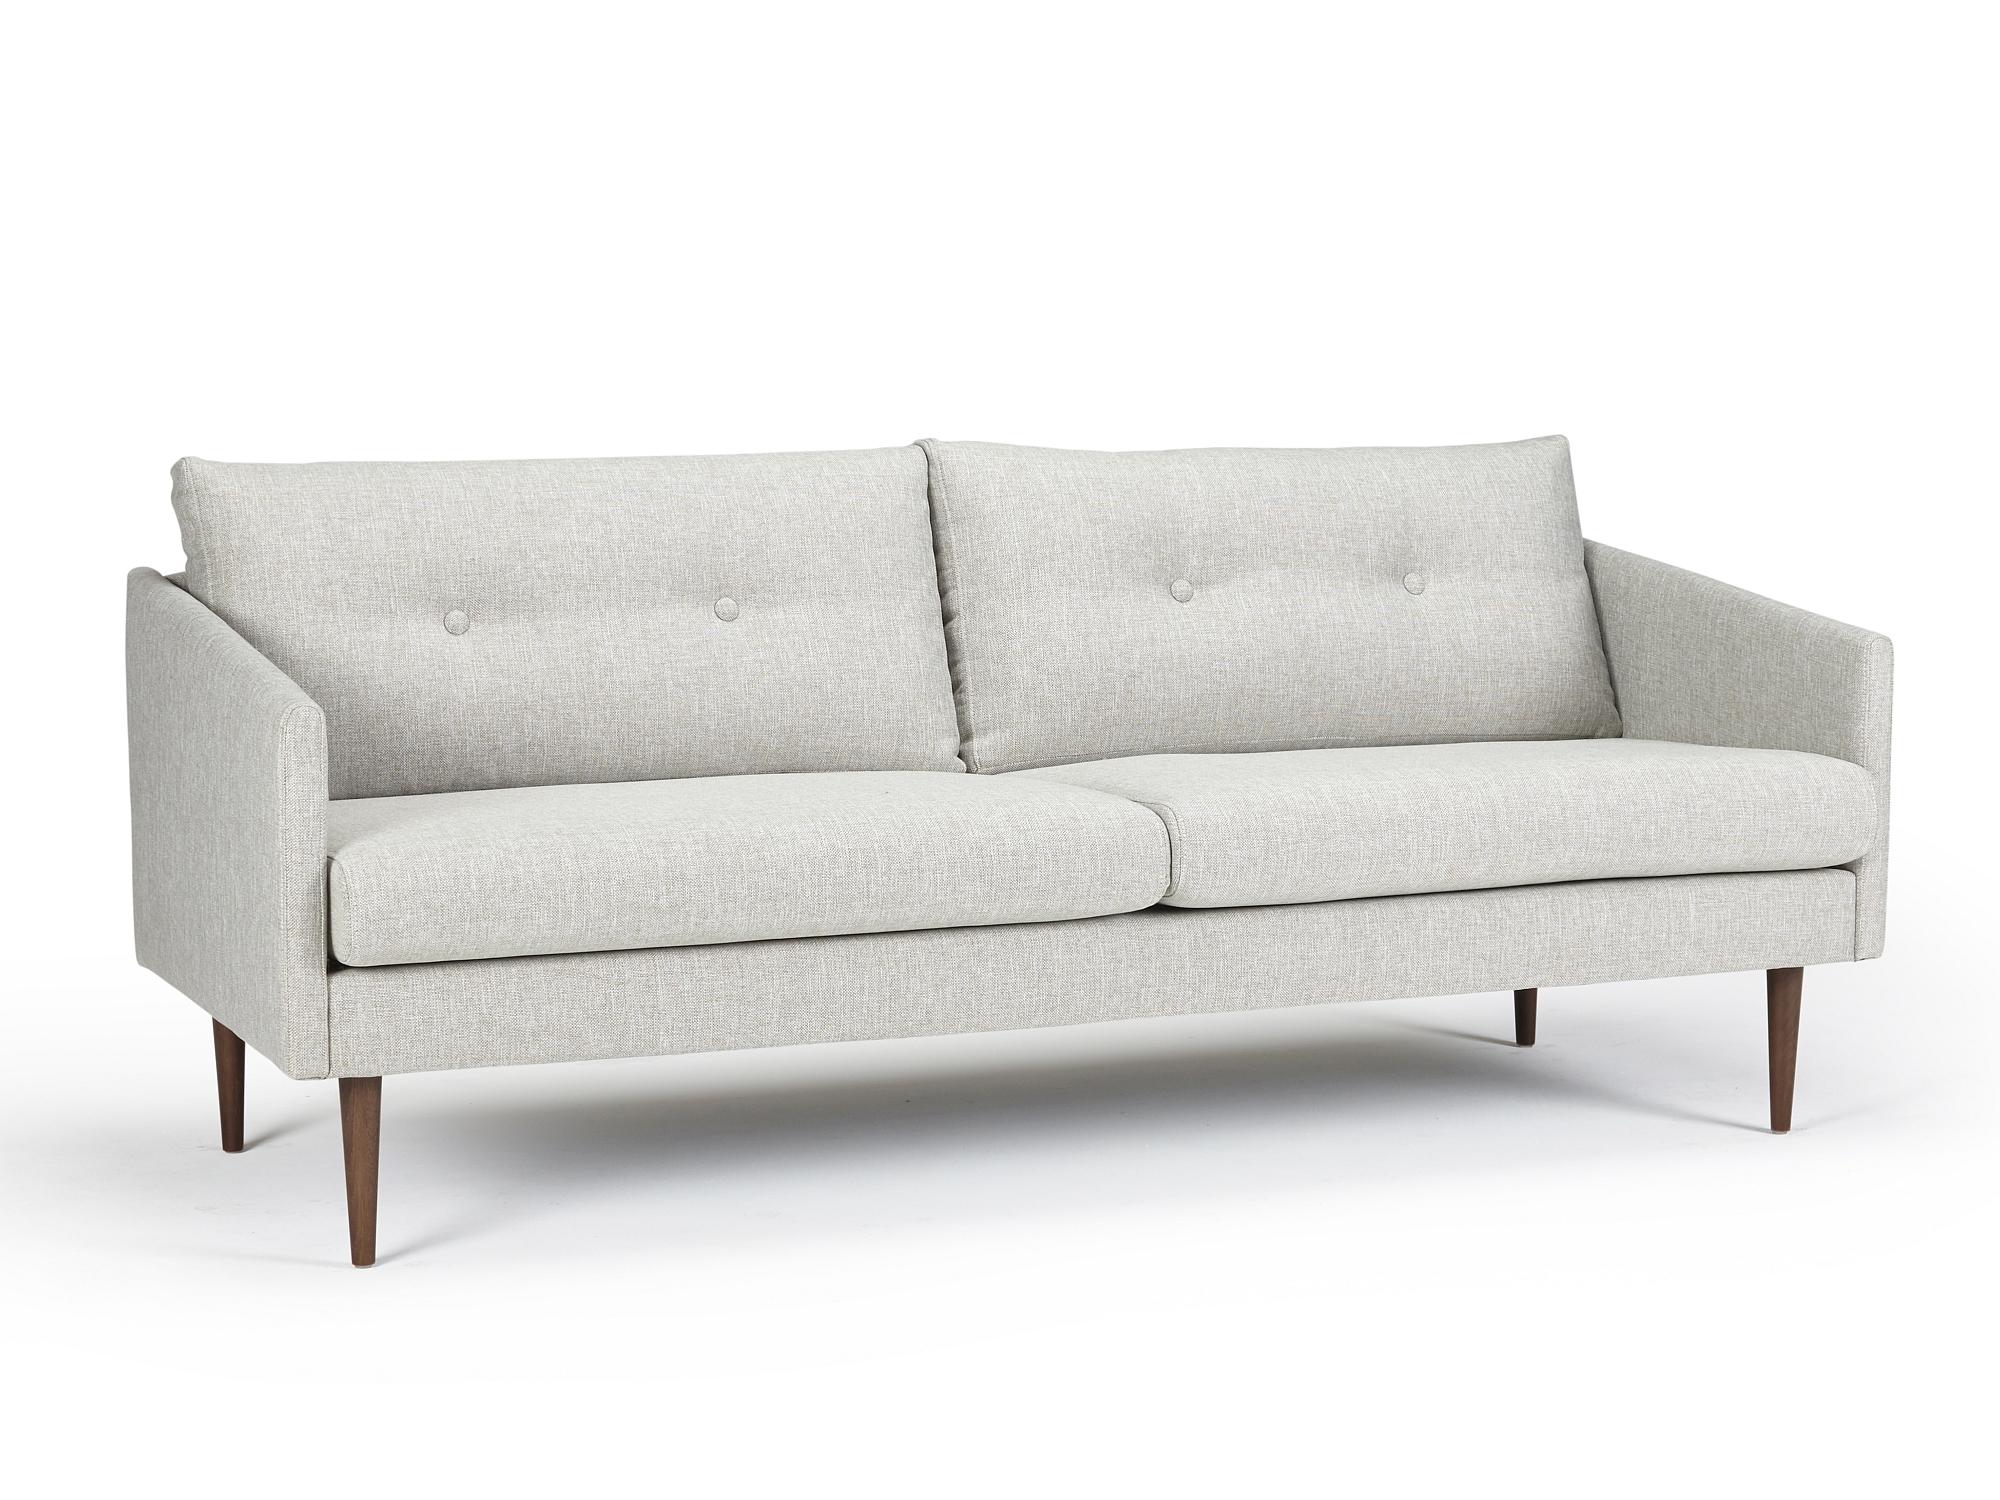 Sofa 3sitzer Good Modernes Design Sofa Hygge Anthrazit Cm